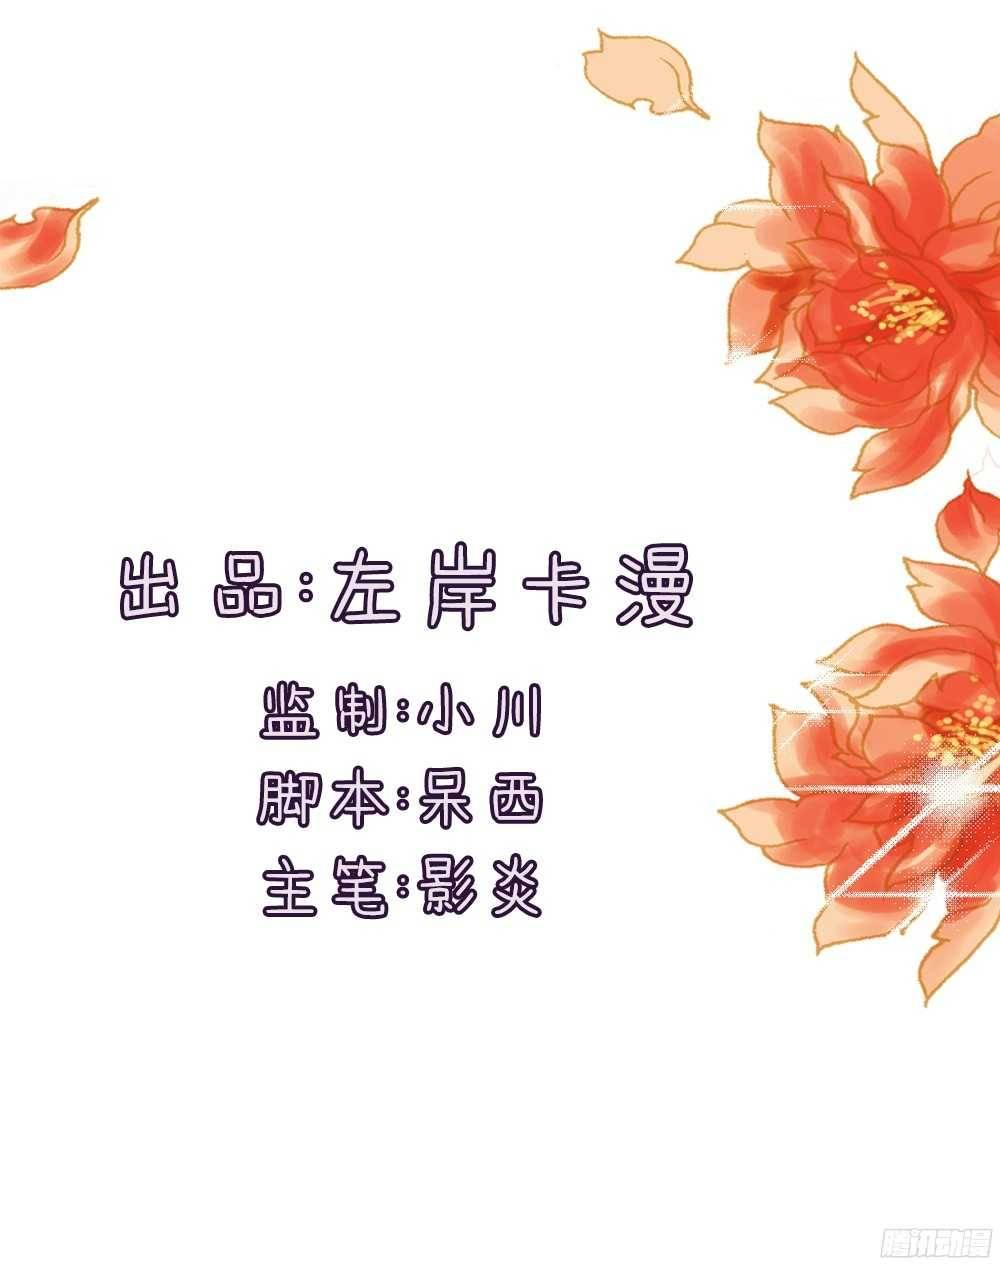 Bạn Trai Minh Tinh Bức Yêu Chap 43 - Next Chap 44